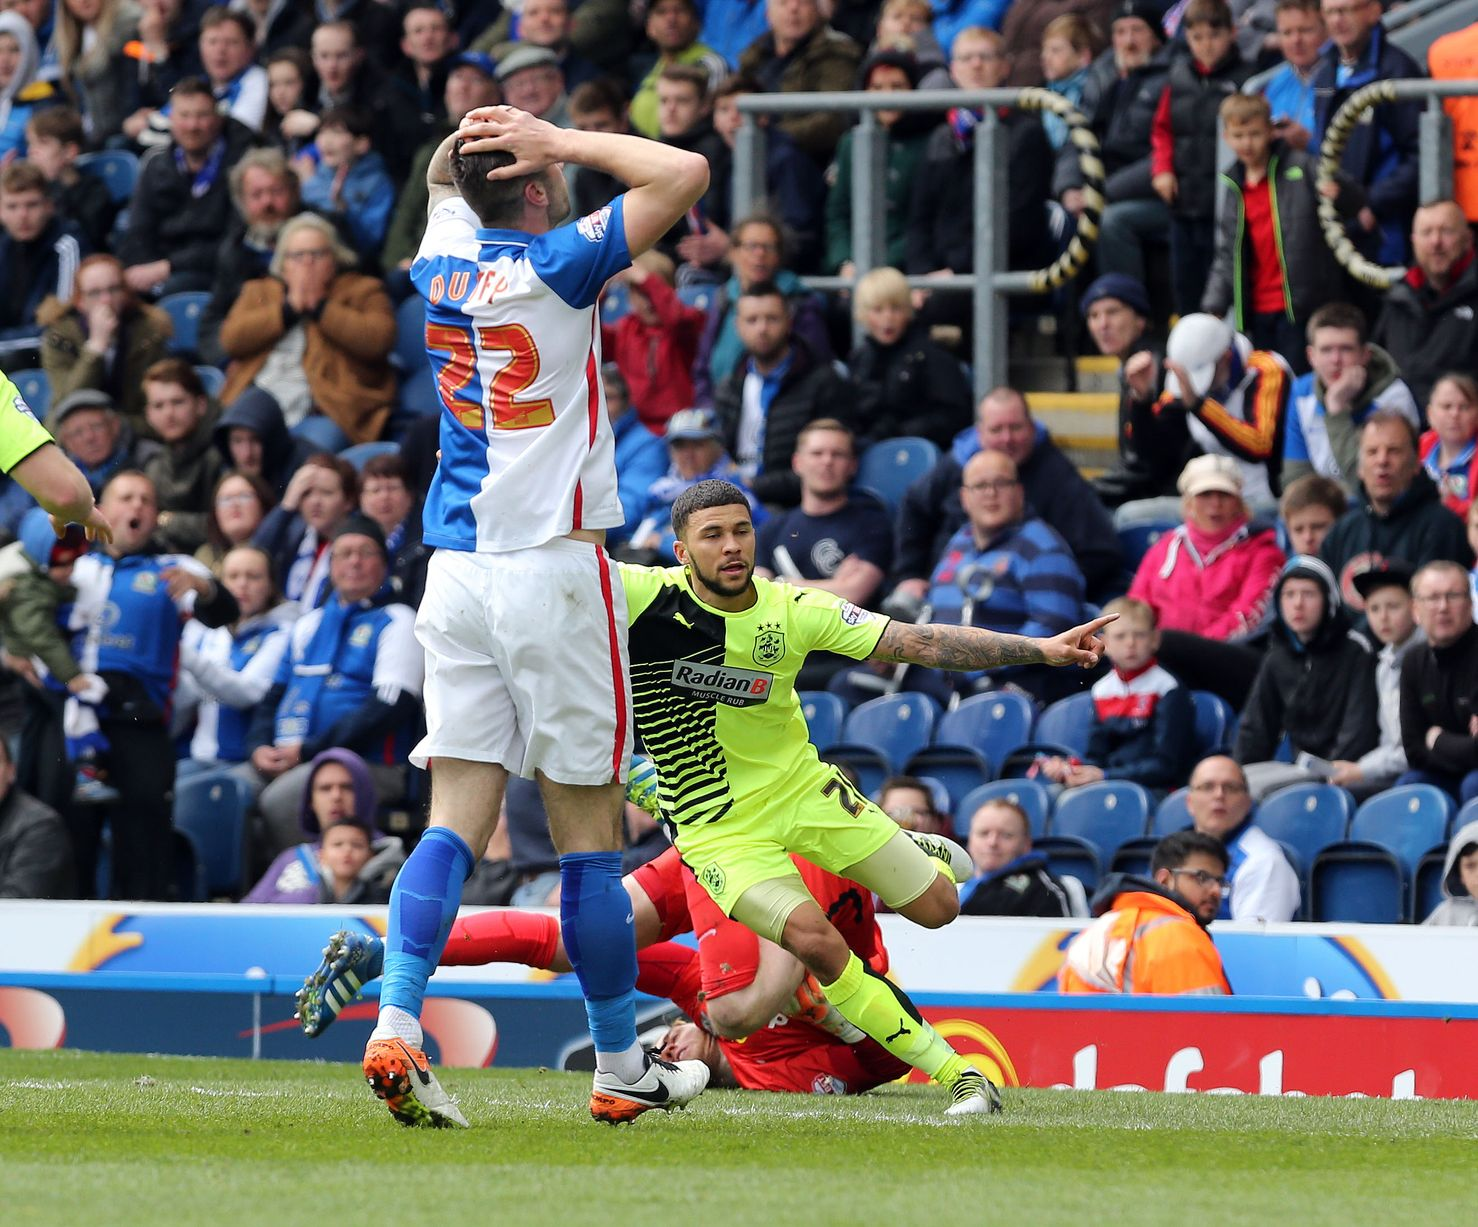 Blackburn 0 Huddersfield Town 2: Match action gallery - YorkshireLive